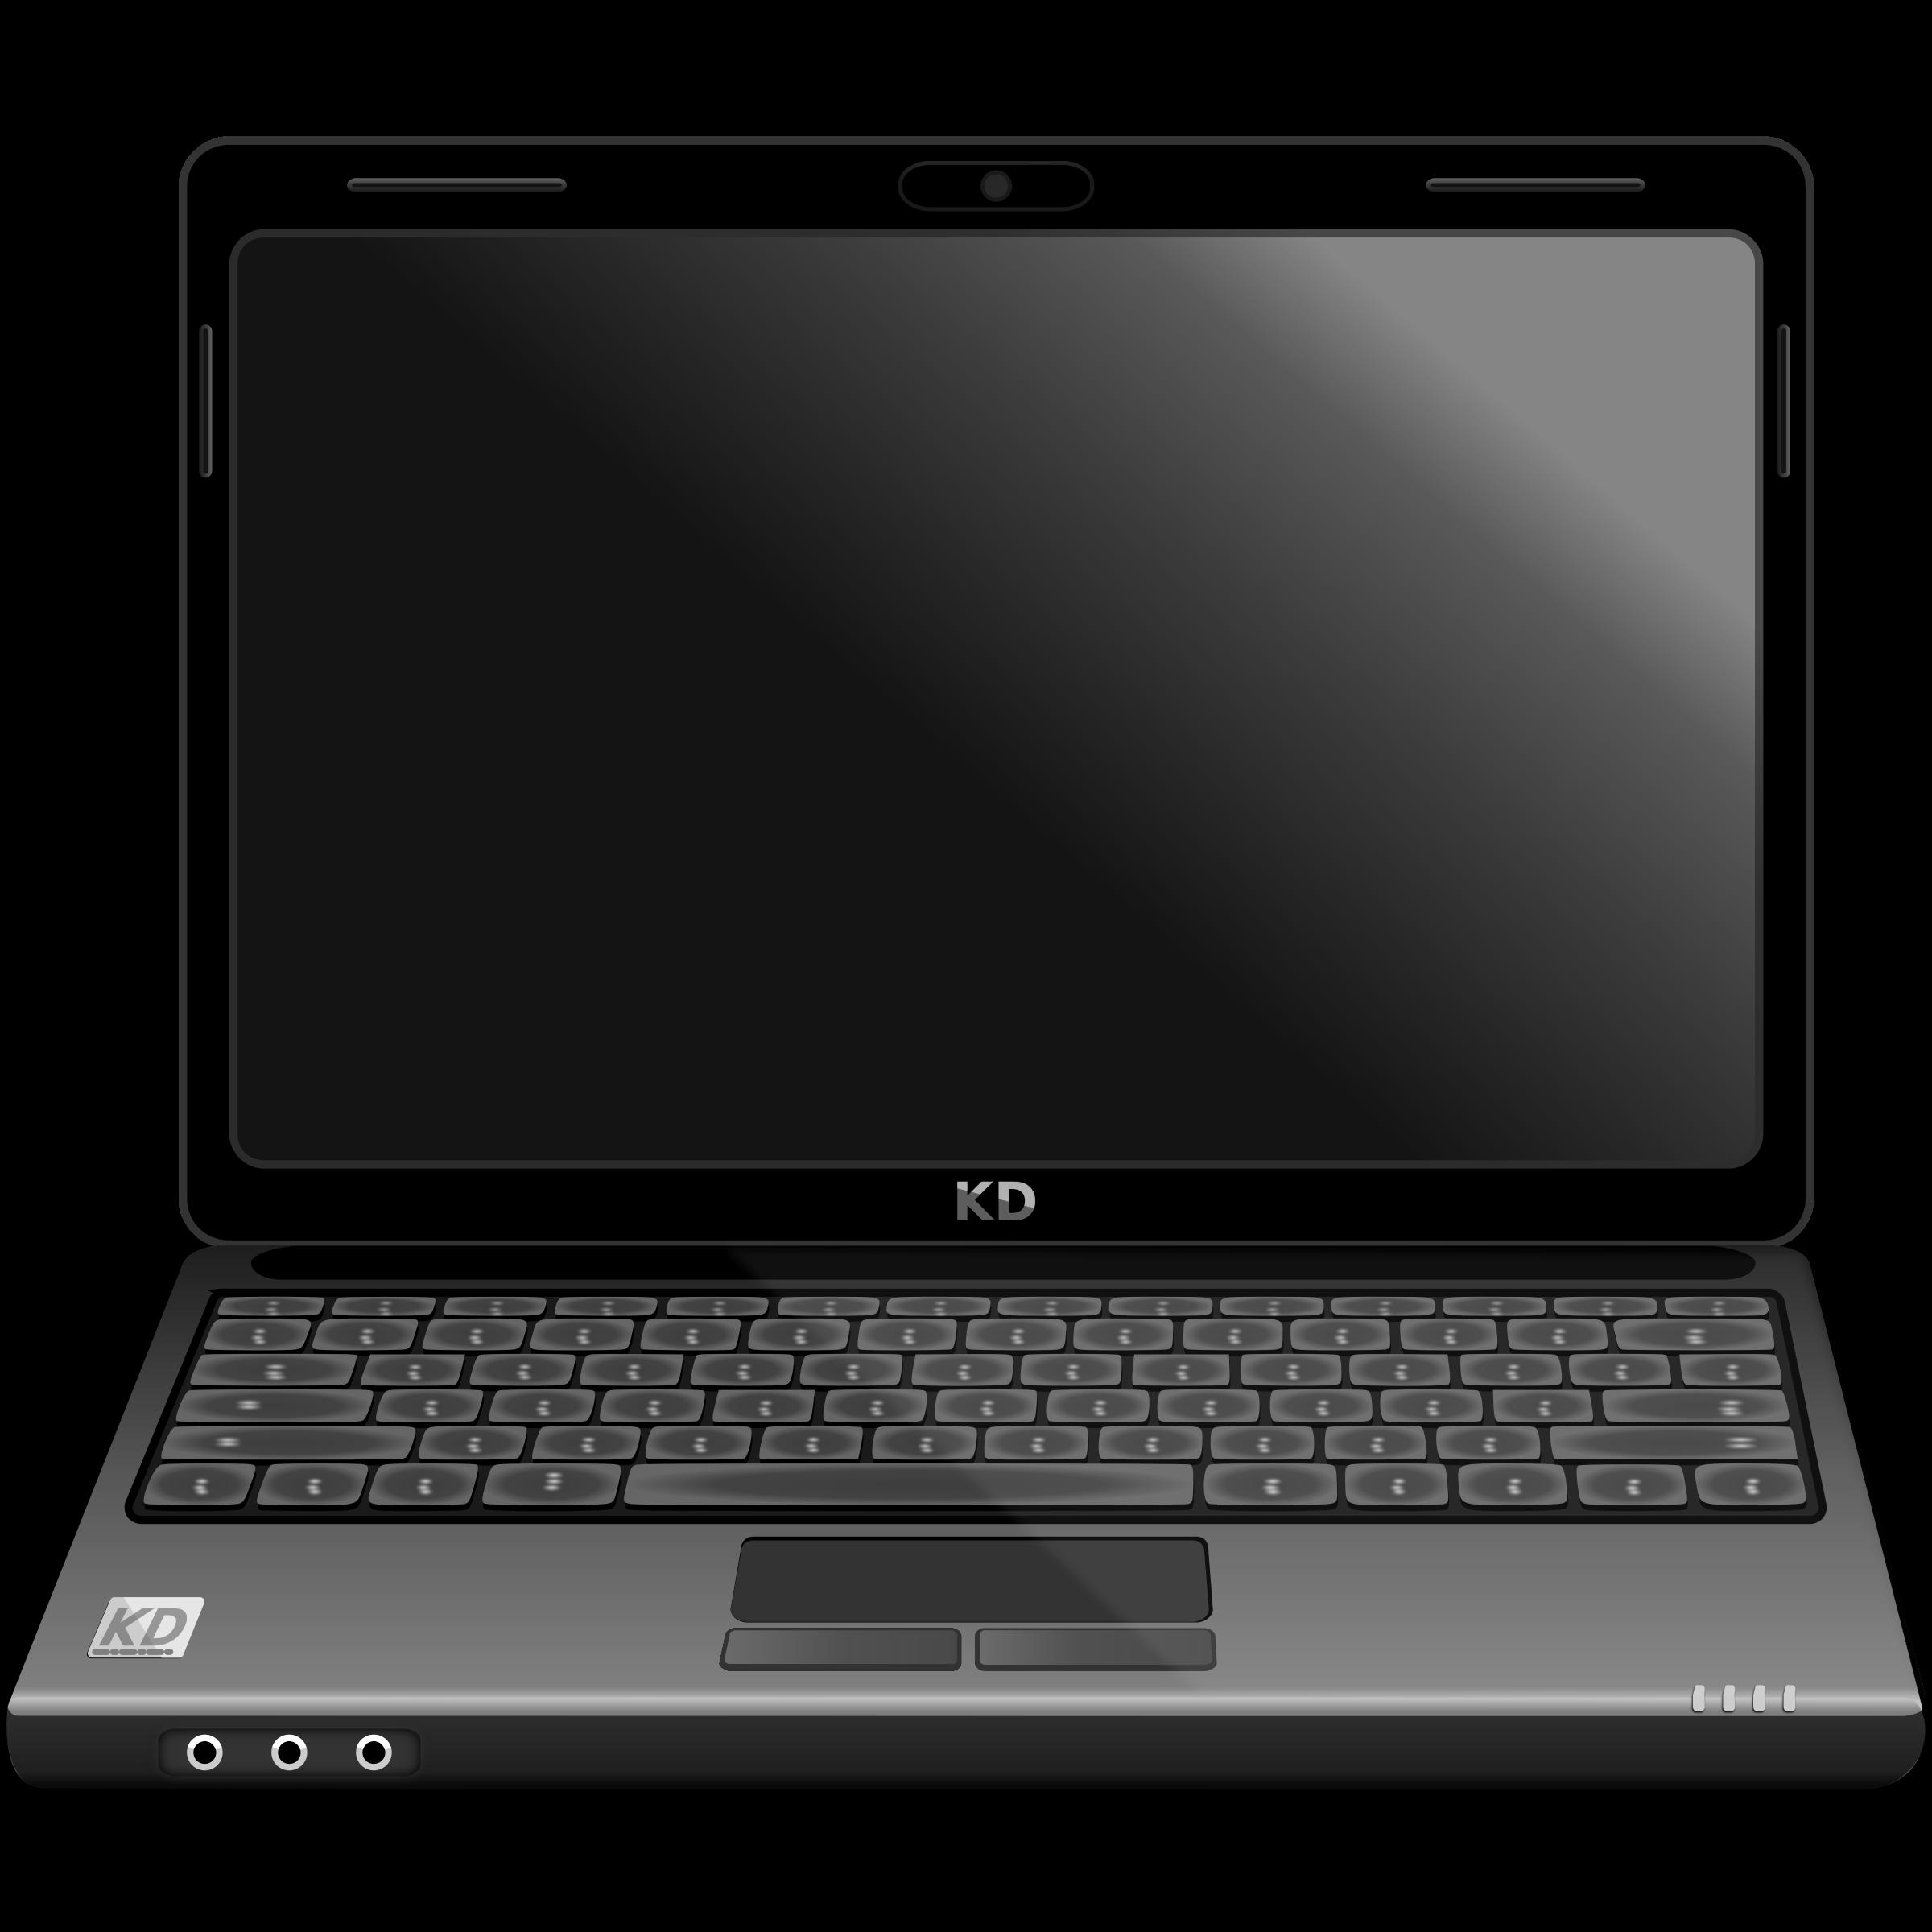 Hp Pavilion 13t 13 3 Laptop 1080p Ips Core I5 1135g7 16gb Ram 512gb Nvme Ssd 549 Free Shipping Touch Screen Laptop Laptop Price Hp Envy 15